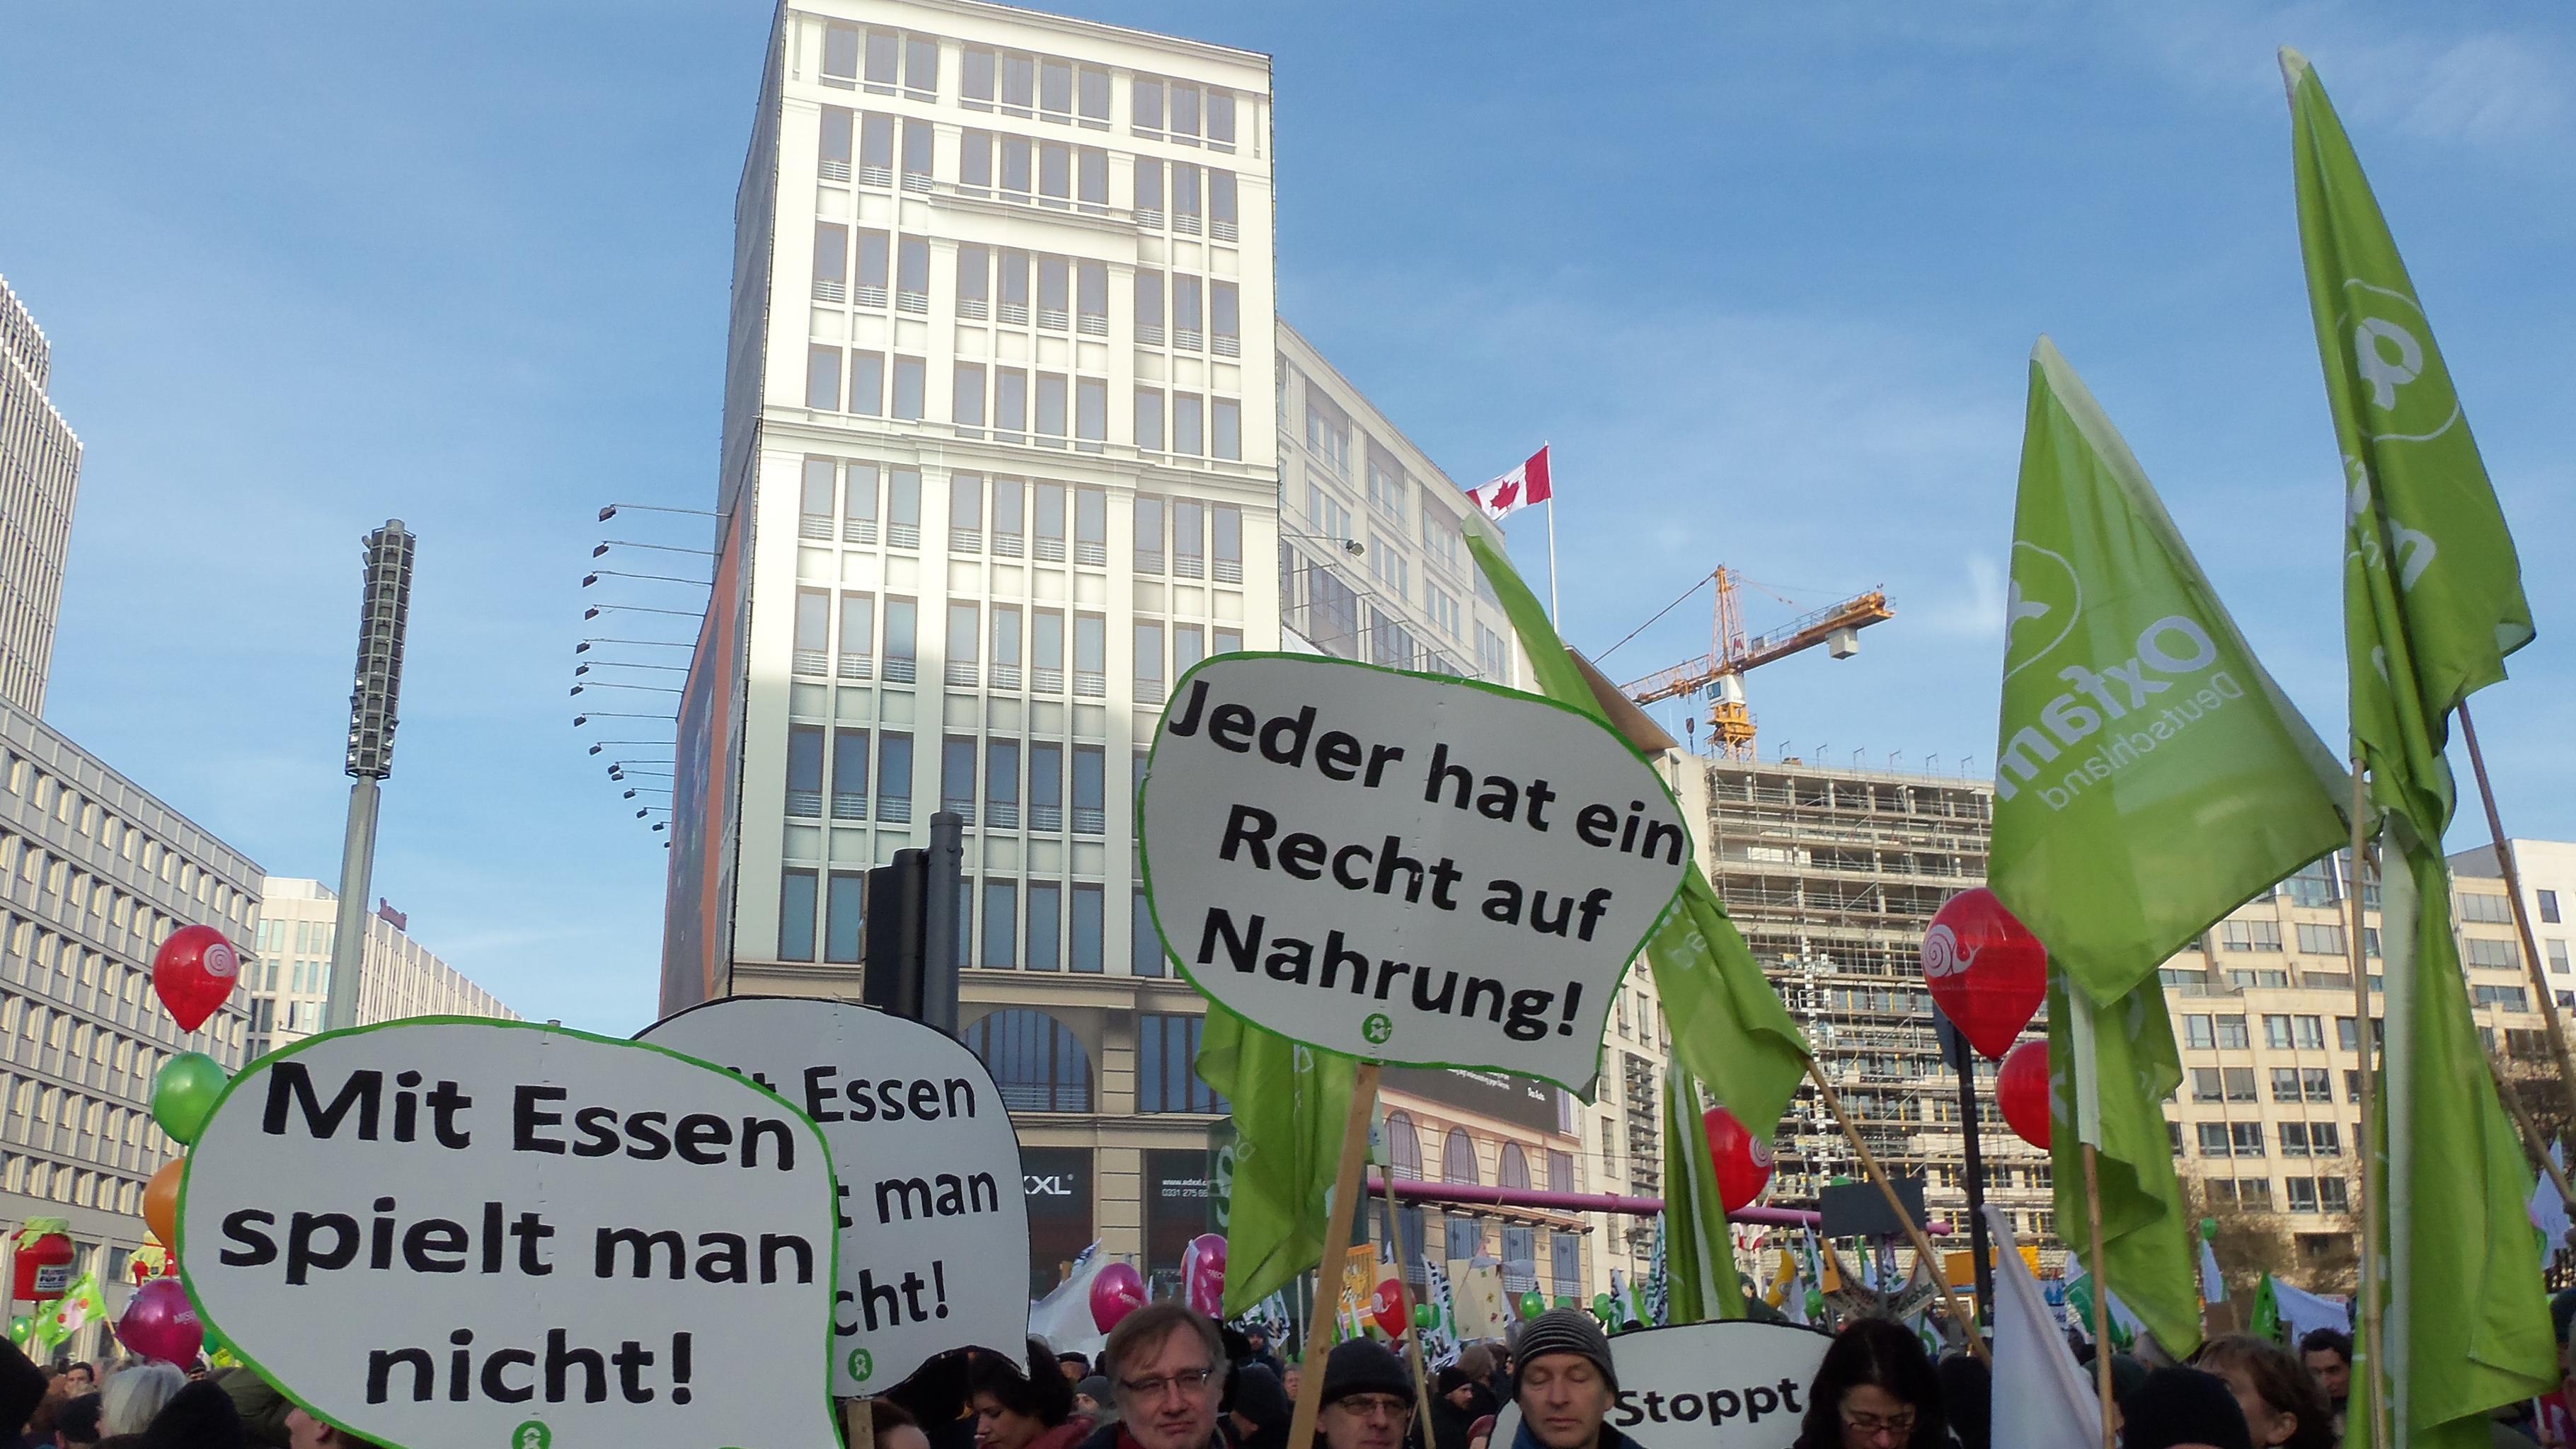 """Wir haben es satt!"" 30.000 Demonstrant/innen zogen durch Berliner Innenstadt"